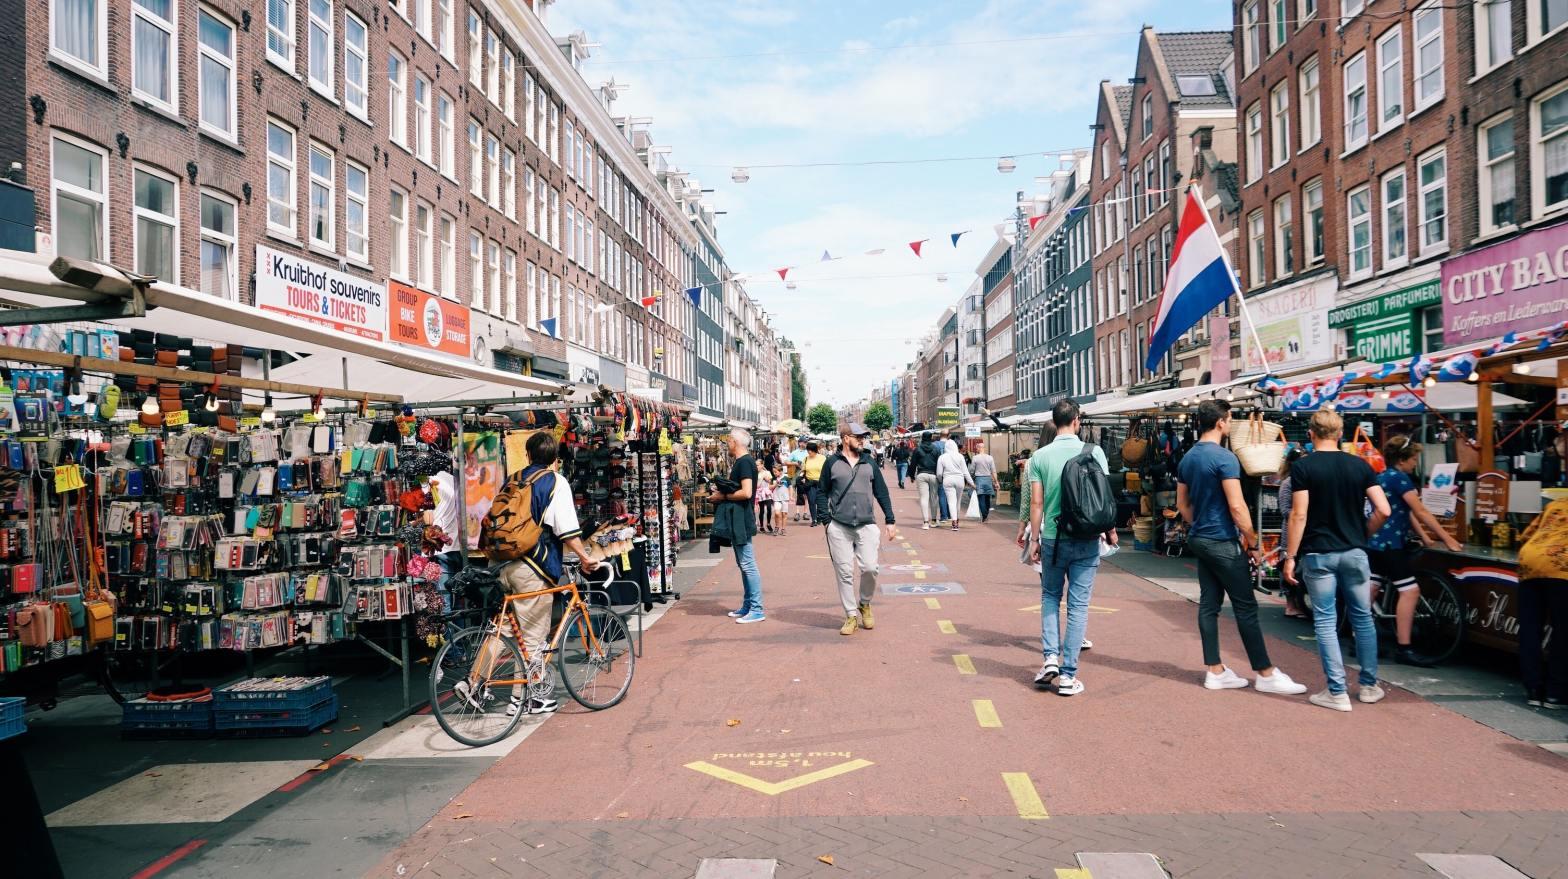 Amsterdam Market Photo by Matheus Frade